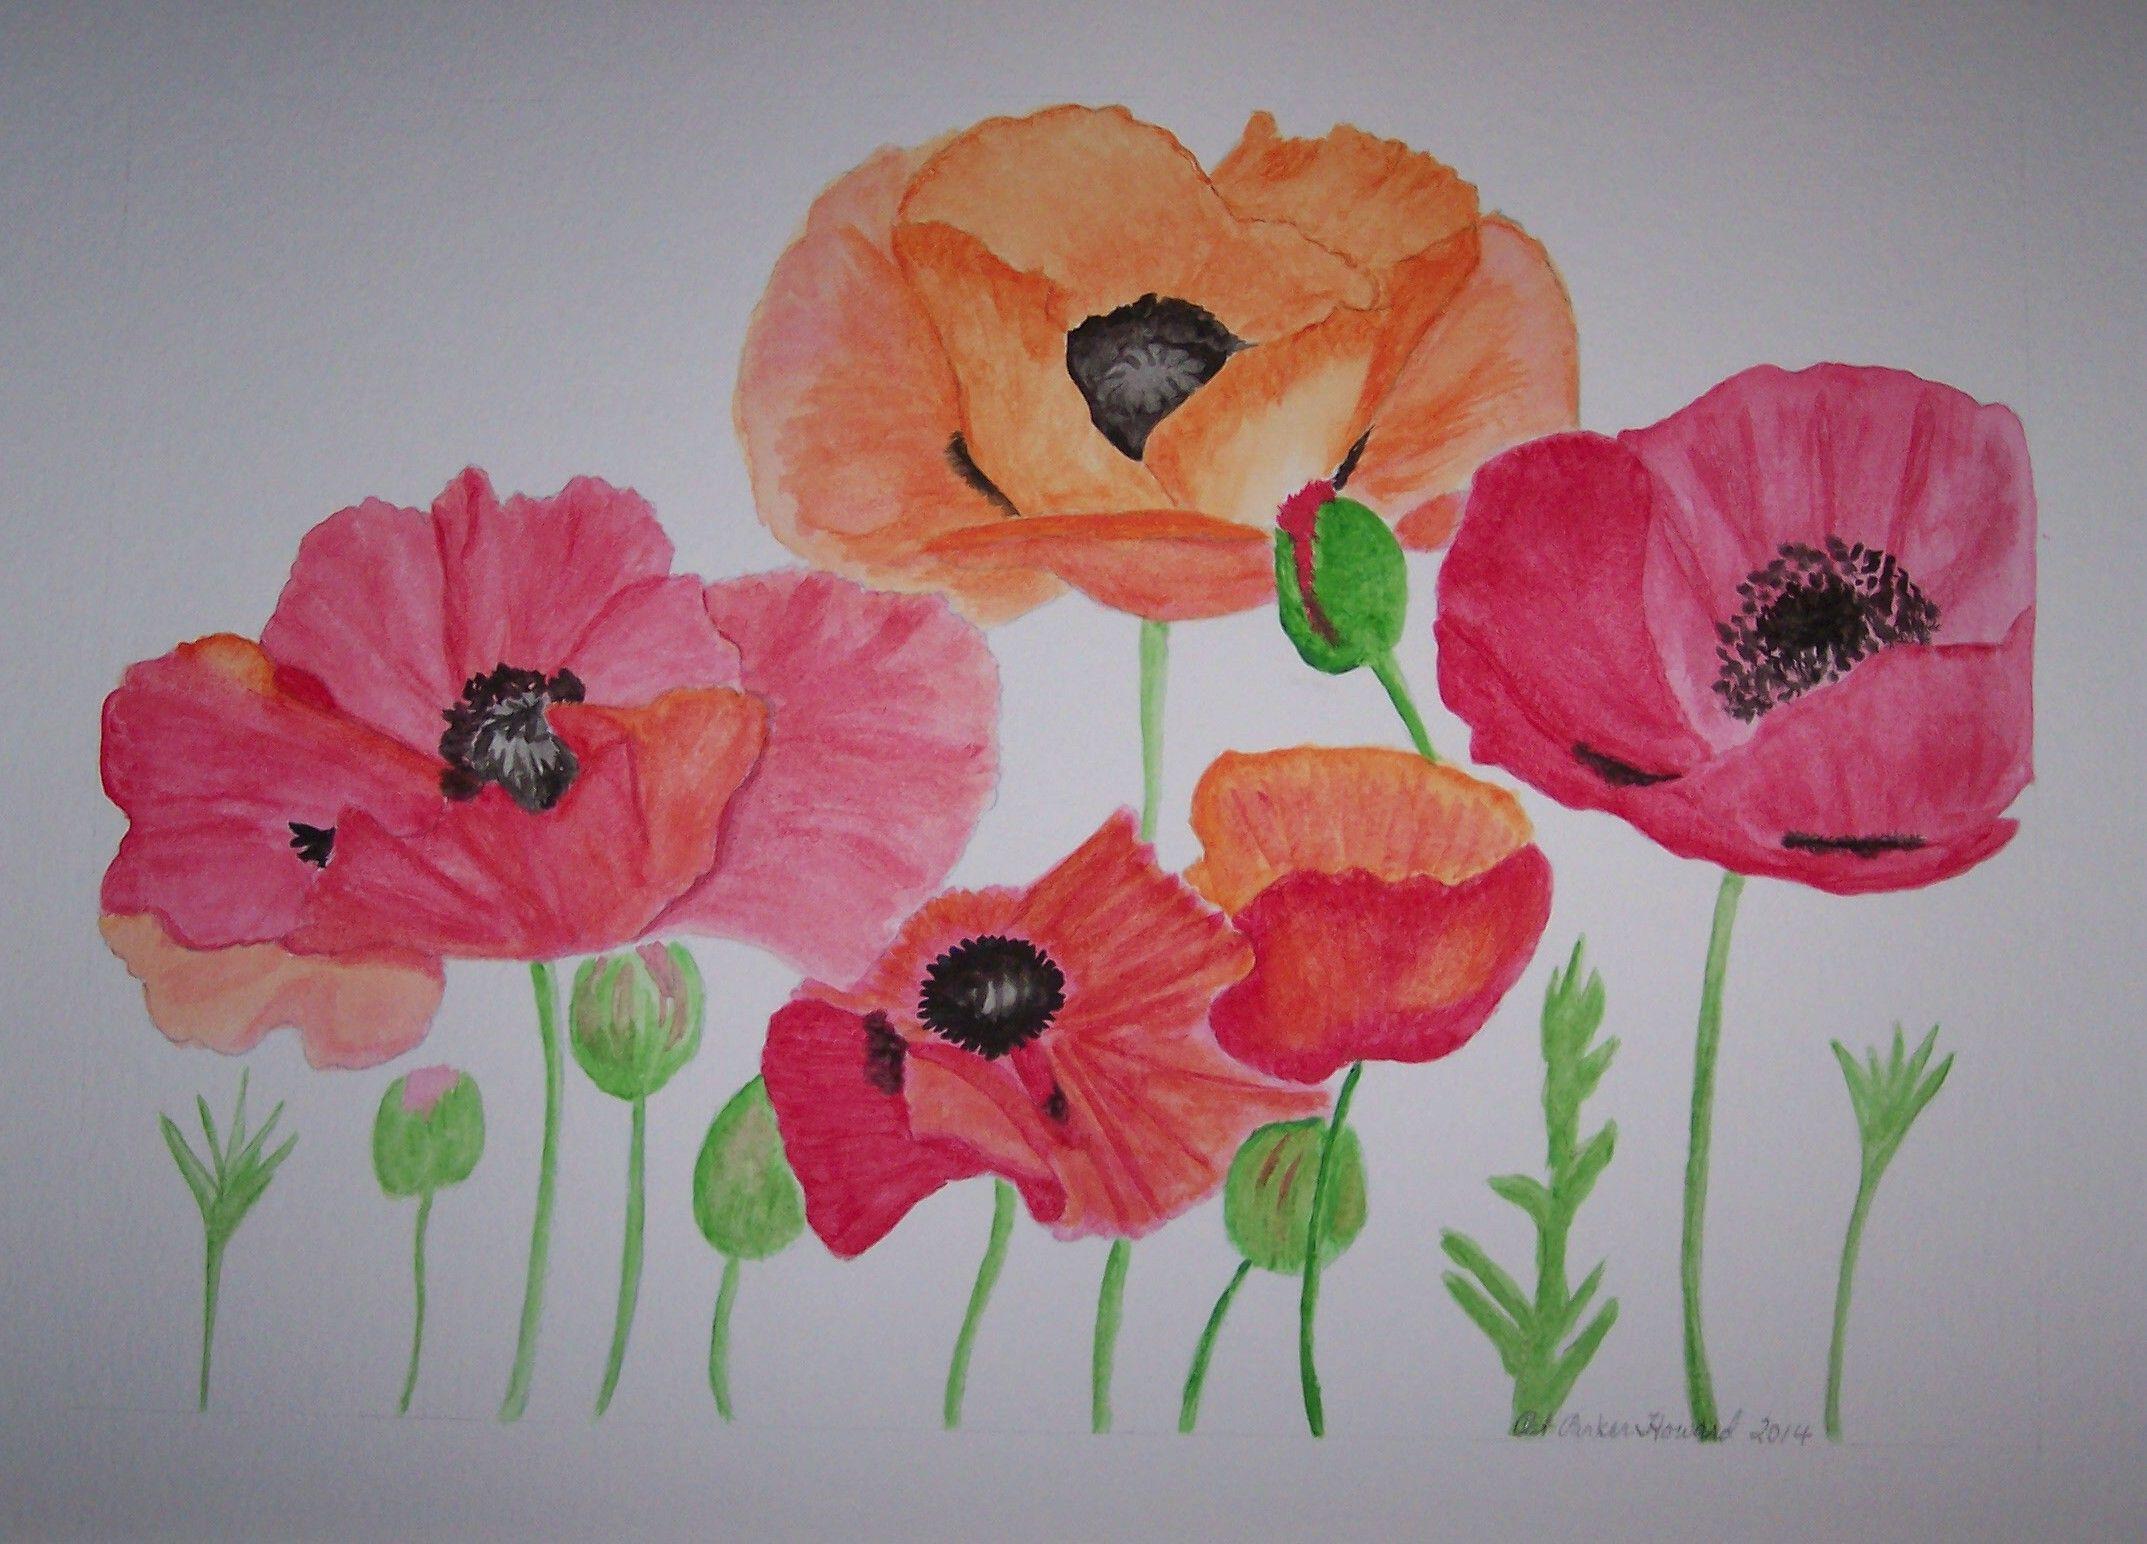 Poppy flower essay in hindi best flower 2017 nan poppy palette revisited giclee canvas art canvases mightylinksfo